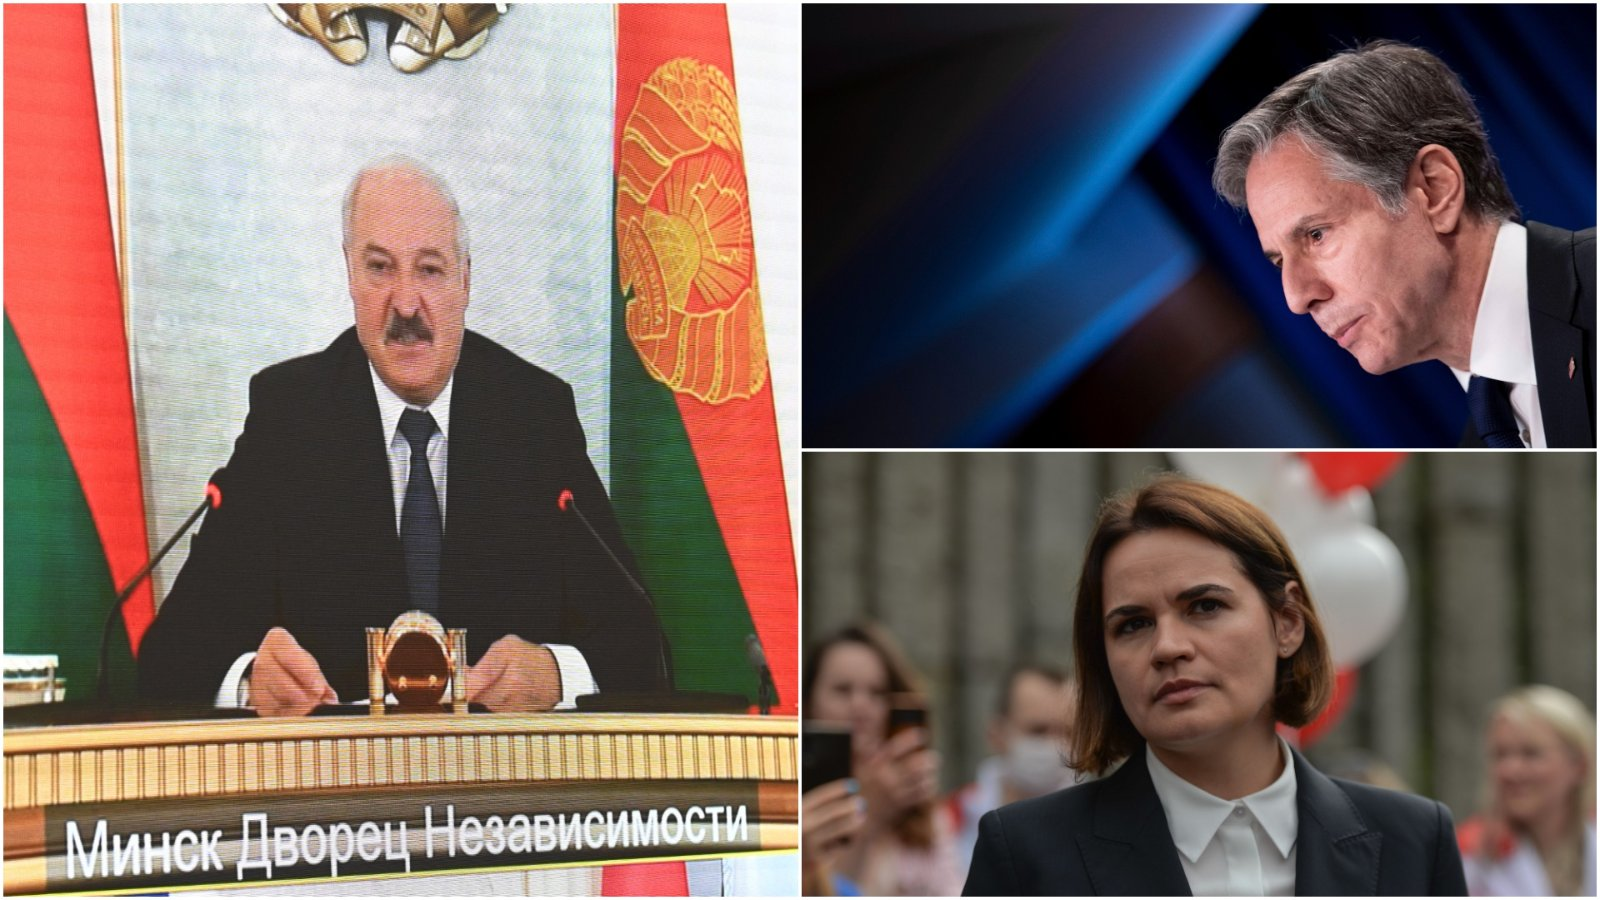 US: Belarus' bid to repatriate Olympic athlete an act of cross-border repression